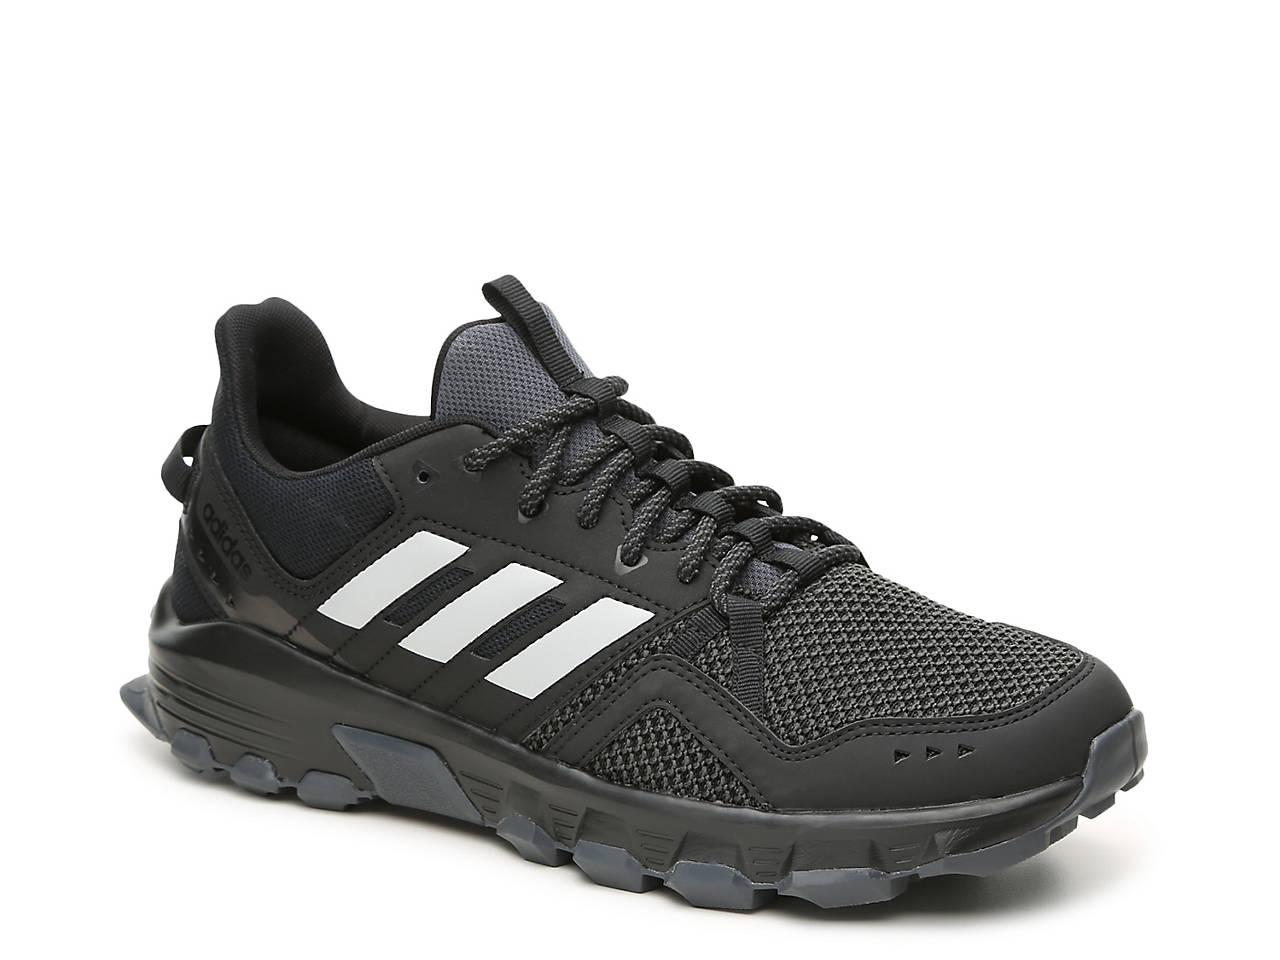 8689564edba1b adidas Rockadia Trail Running Shoe - Men s Men s Shoes